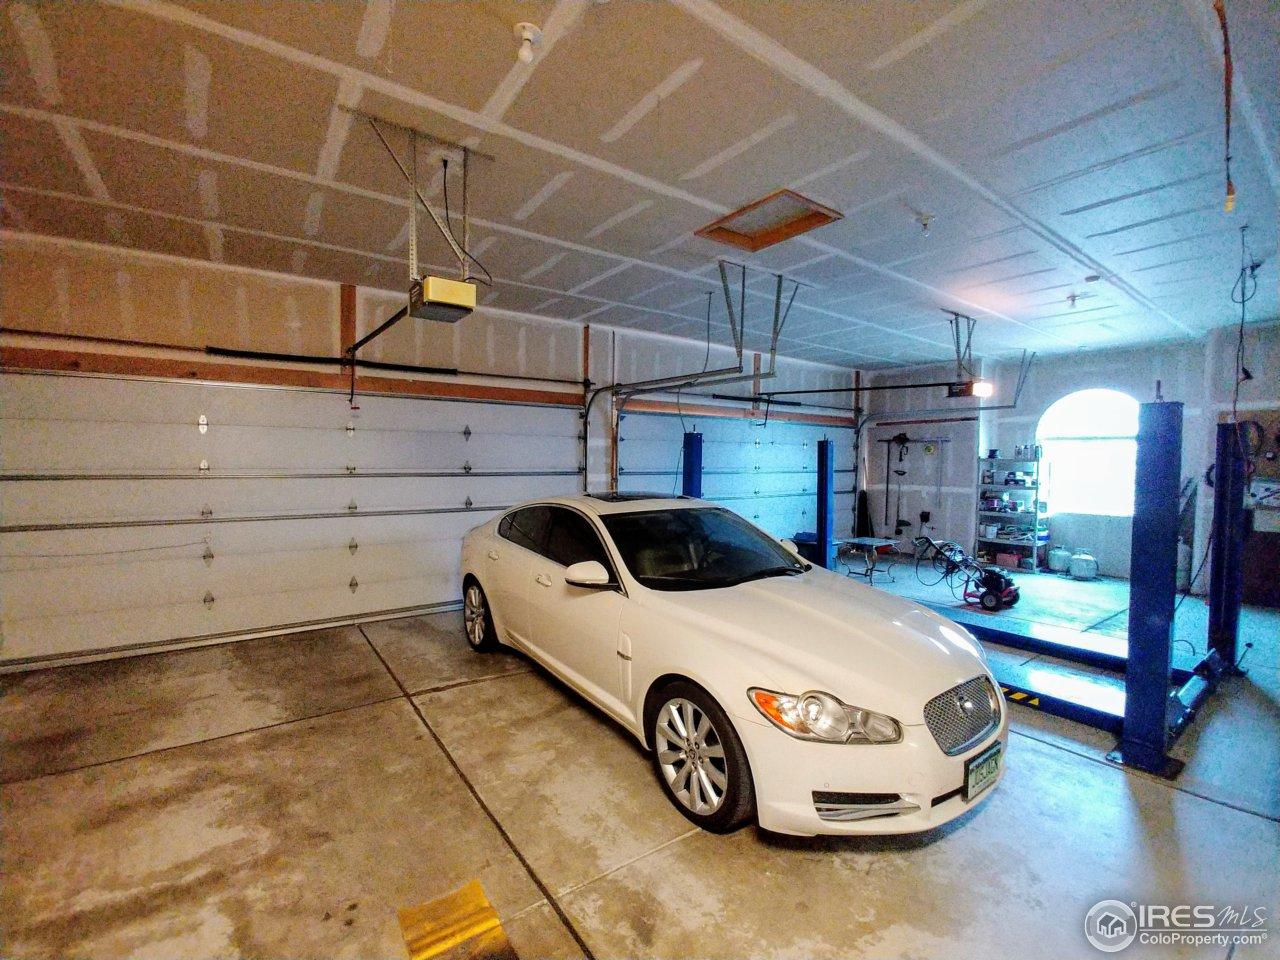 4 car heated garage